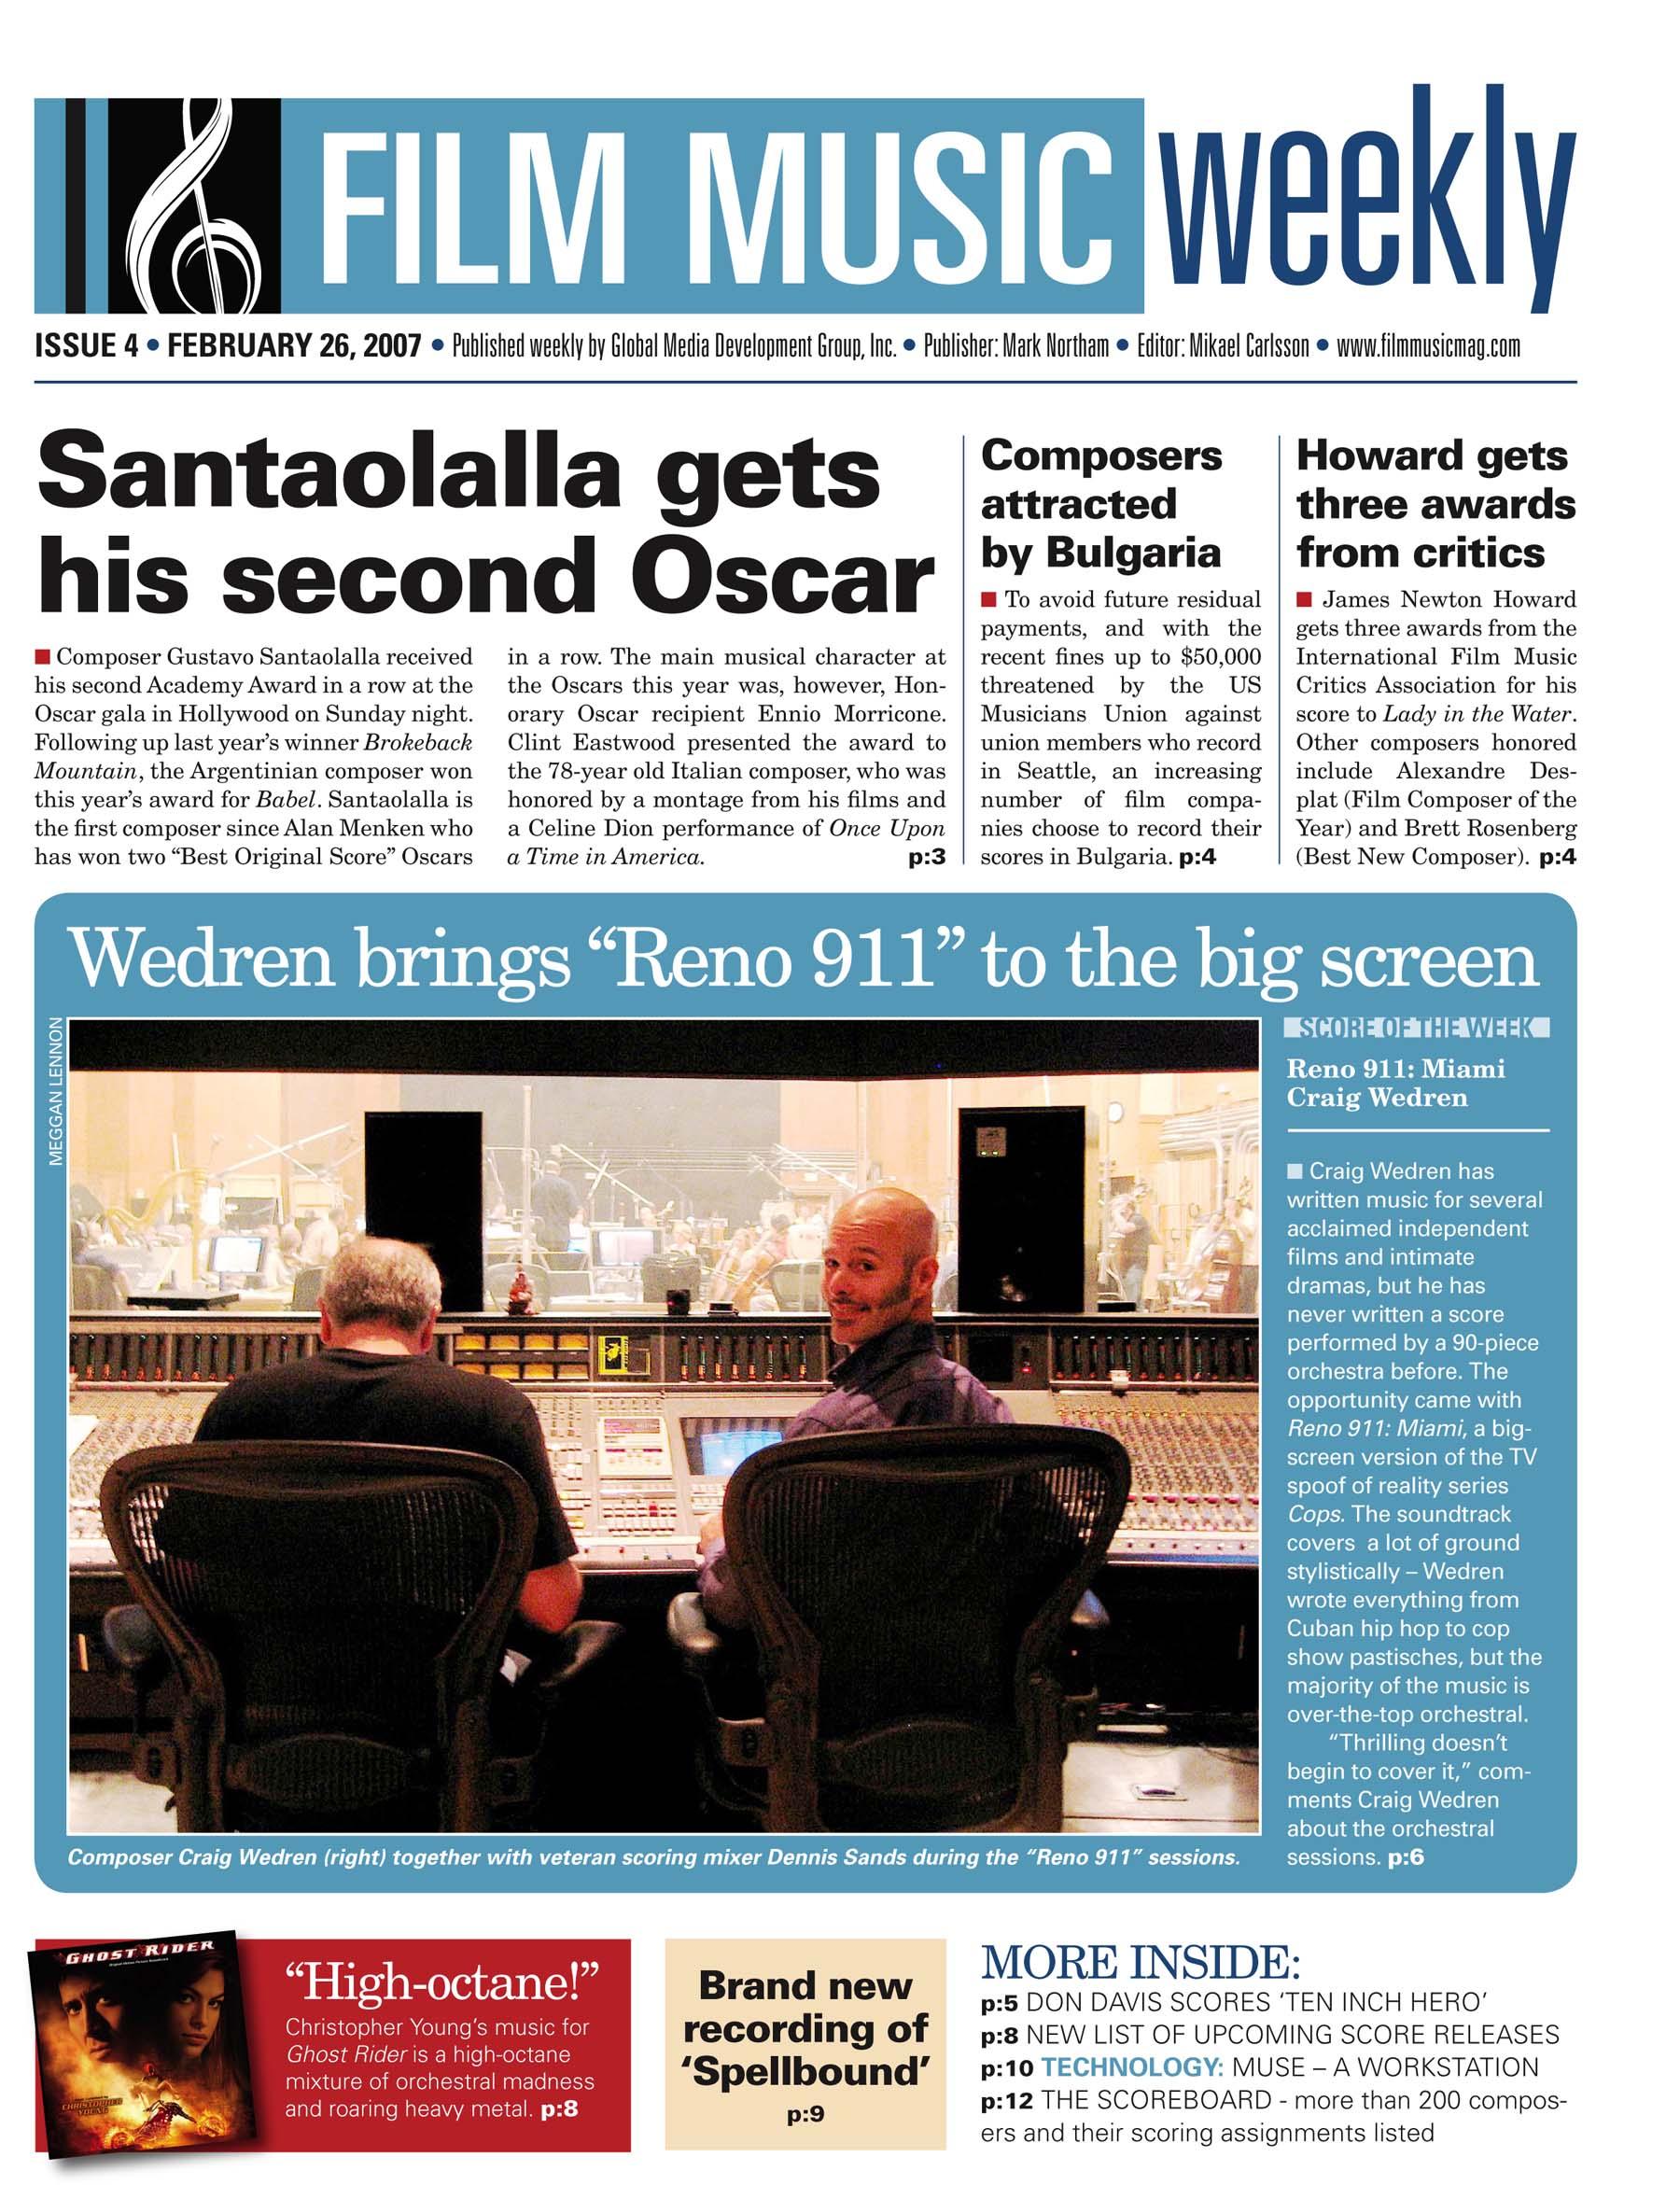 "Wedren brings ""Reno 911"" to the big screen, Film Music Weekly , Feb 26, 2007"